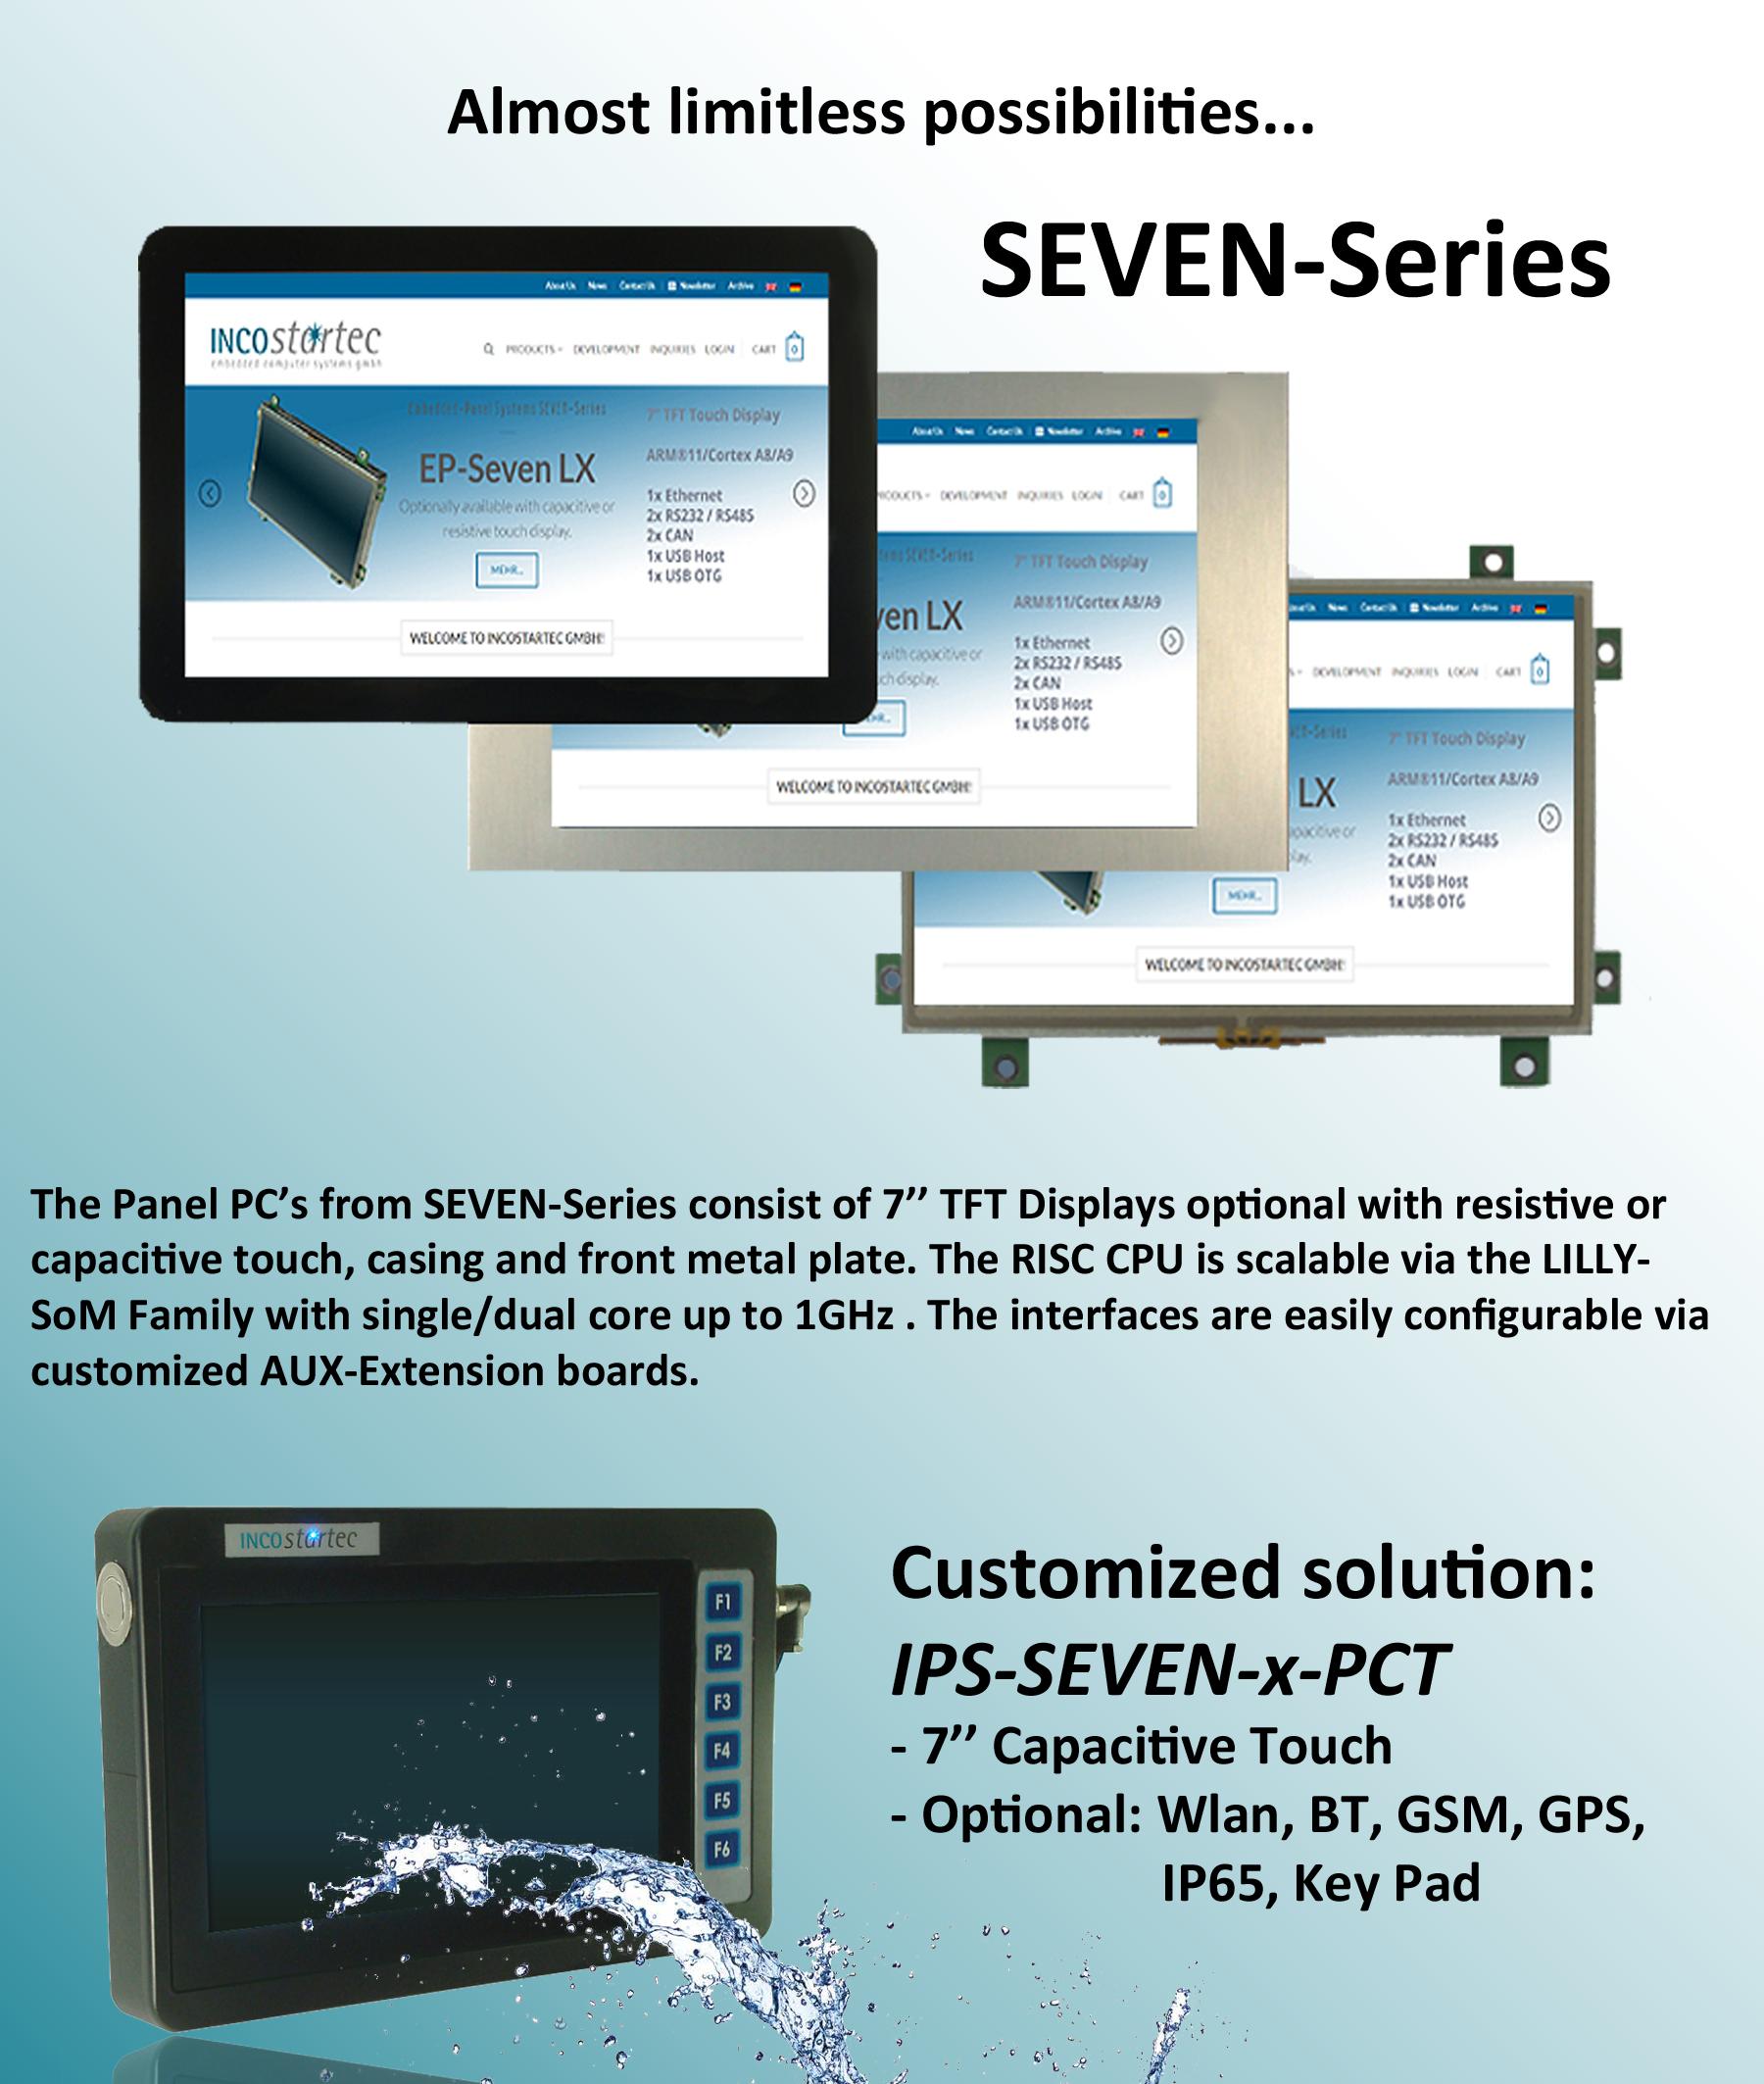 Seven-Series